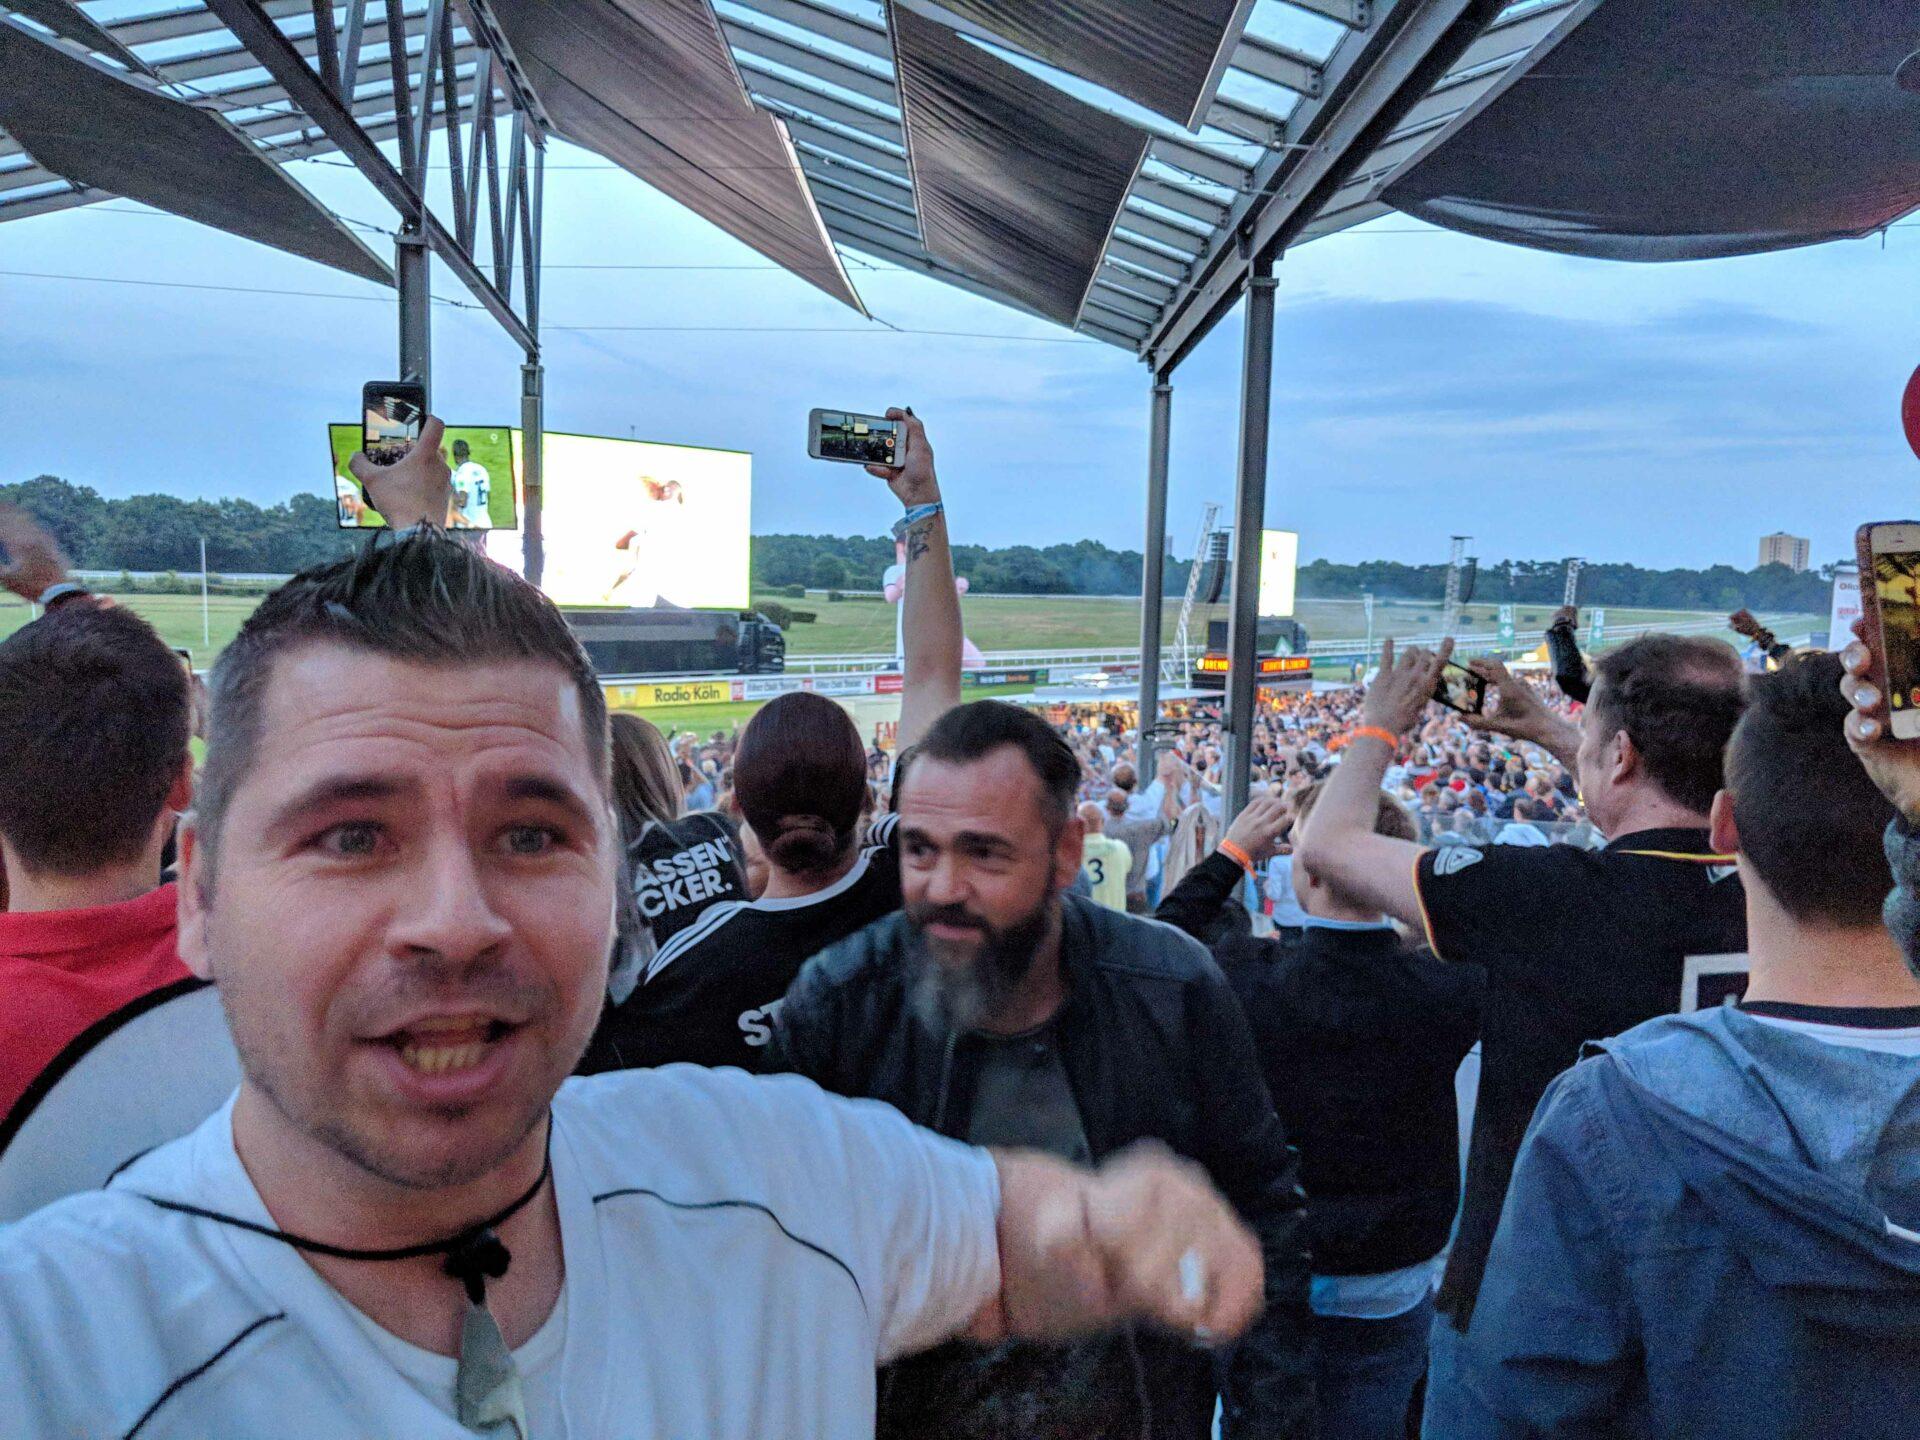 Aufblasbarer Lukas Podolski 10m